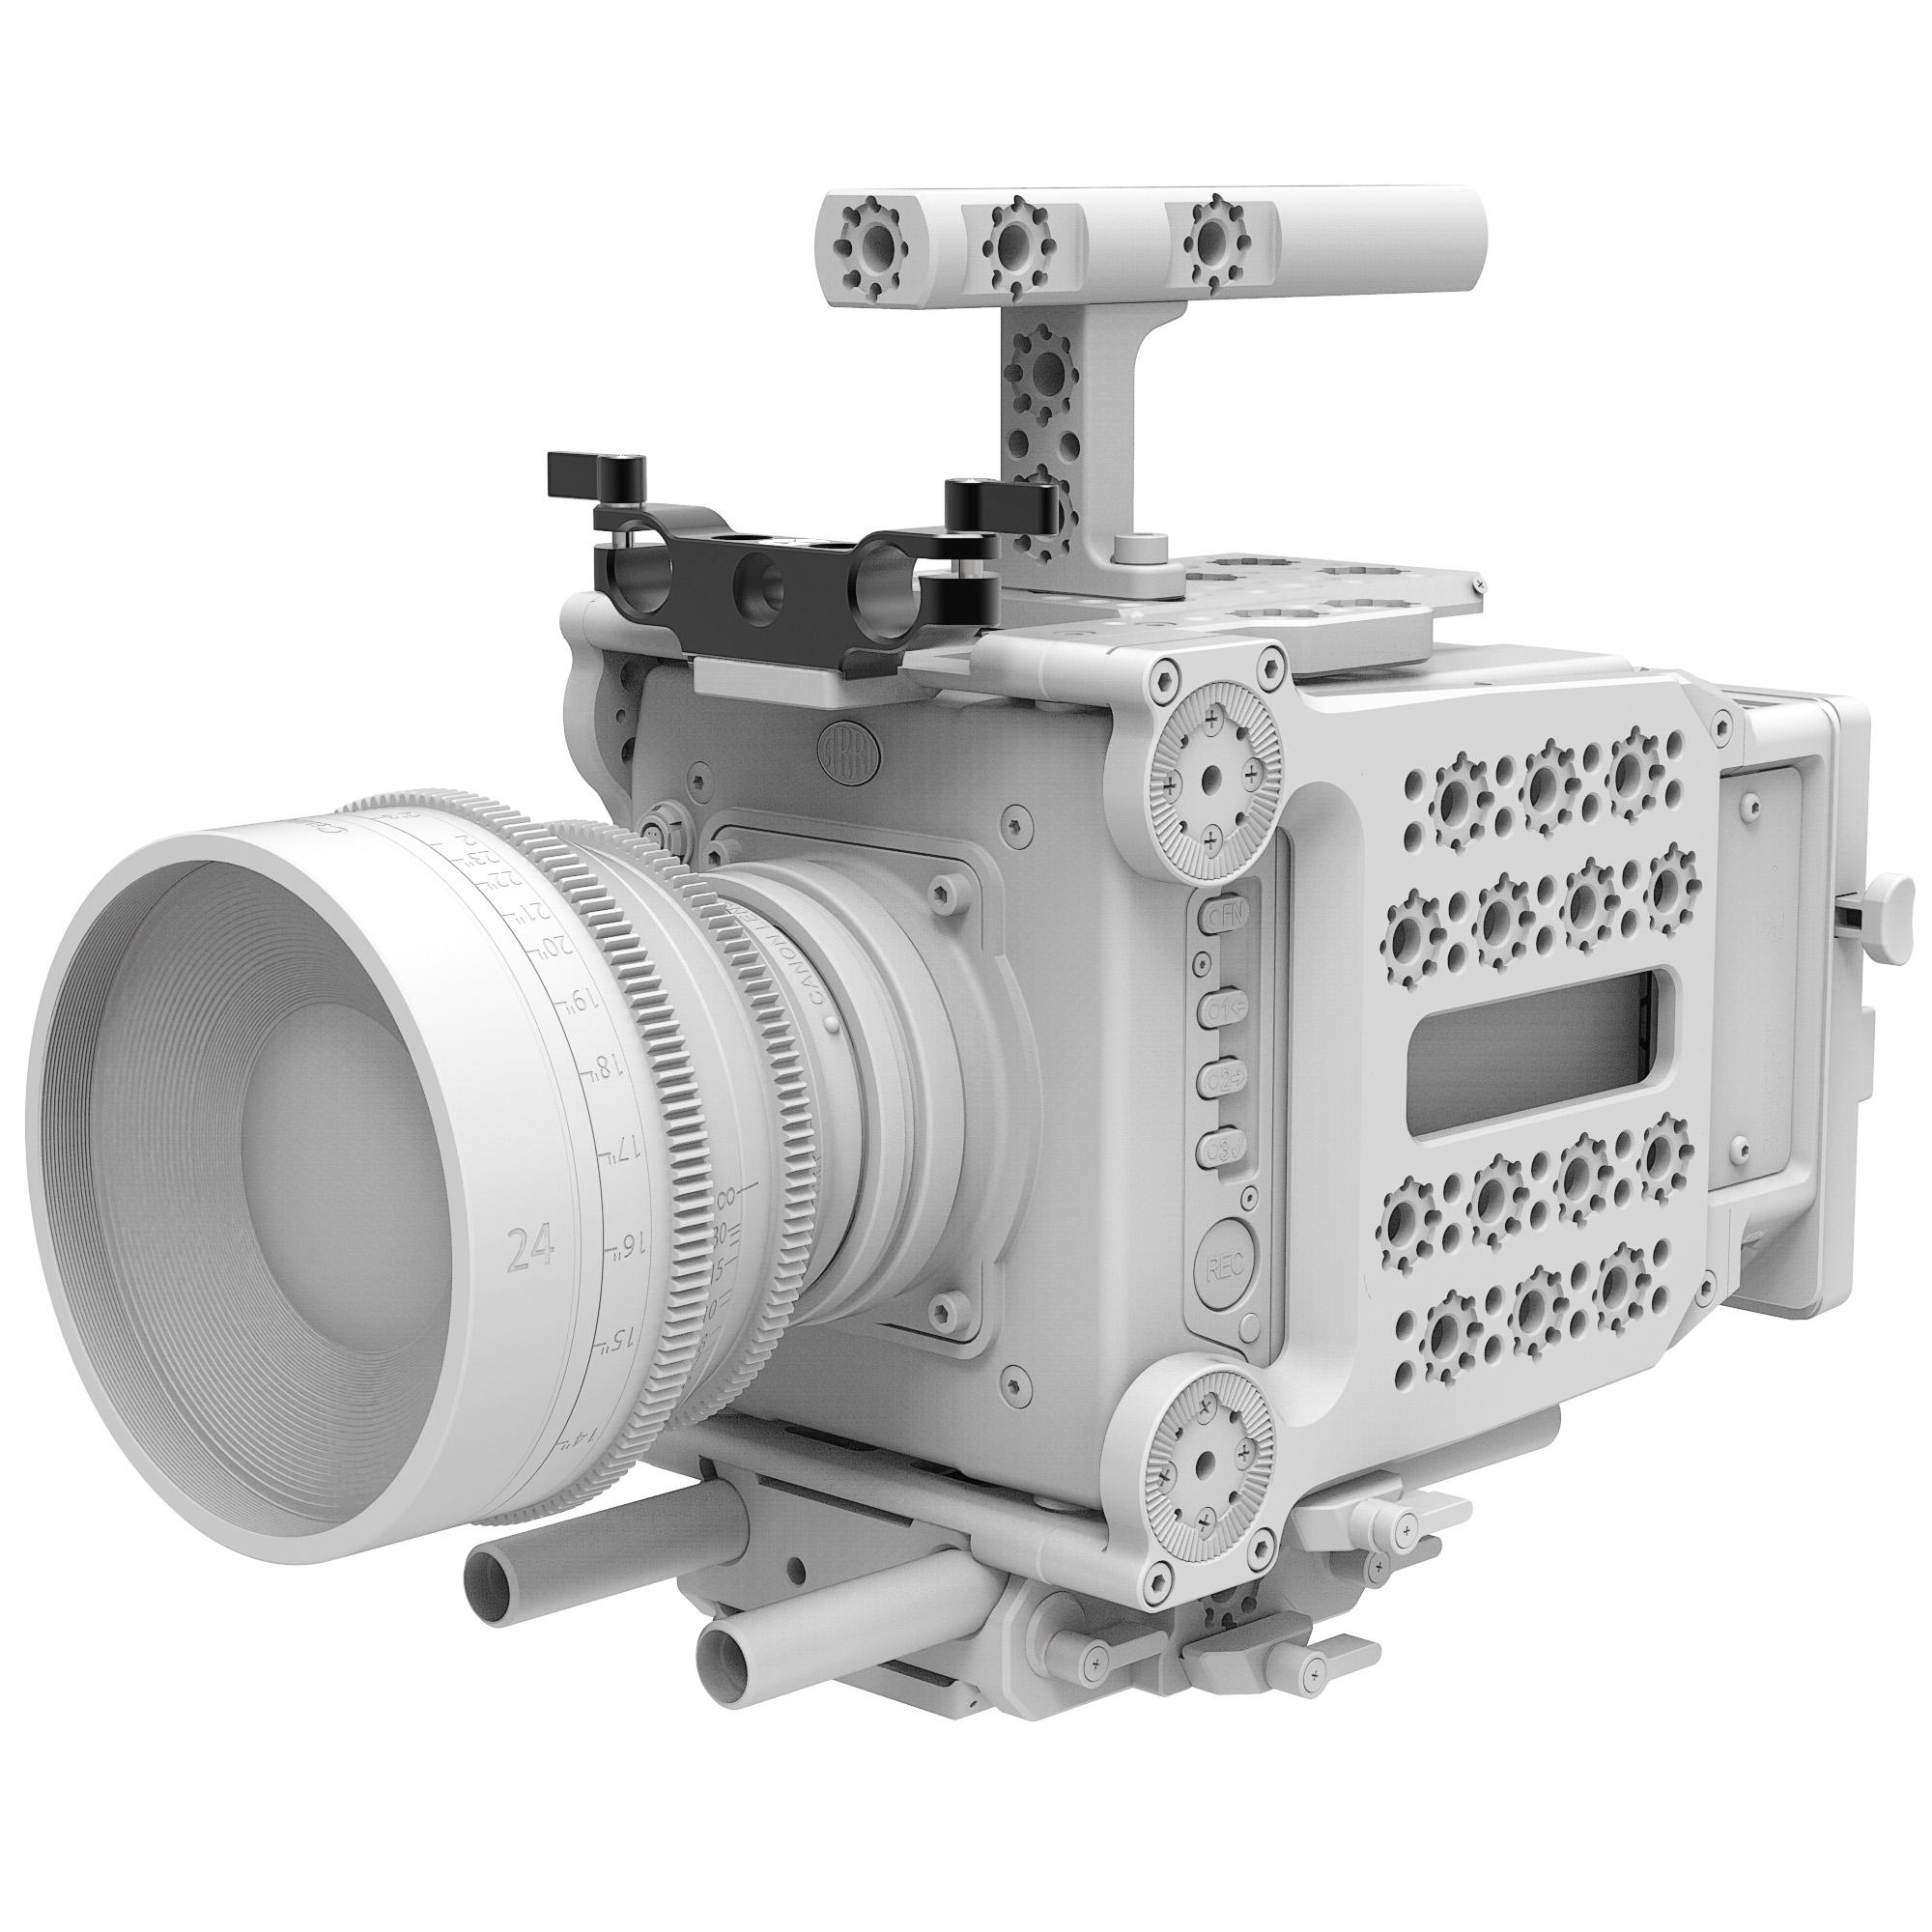 B4003.1010 Left Field Universal 15mm LWS Bracket 3